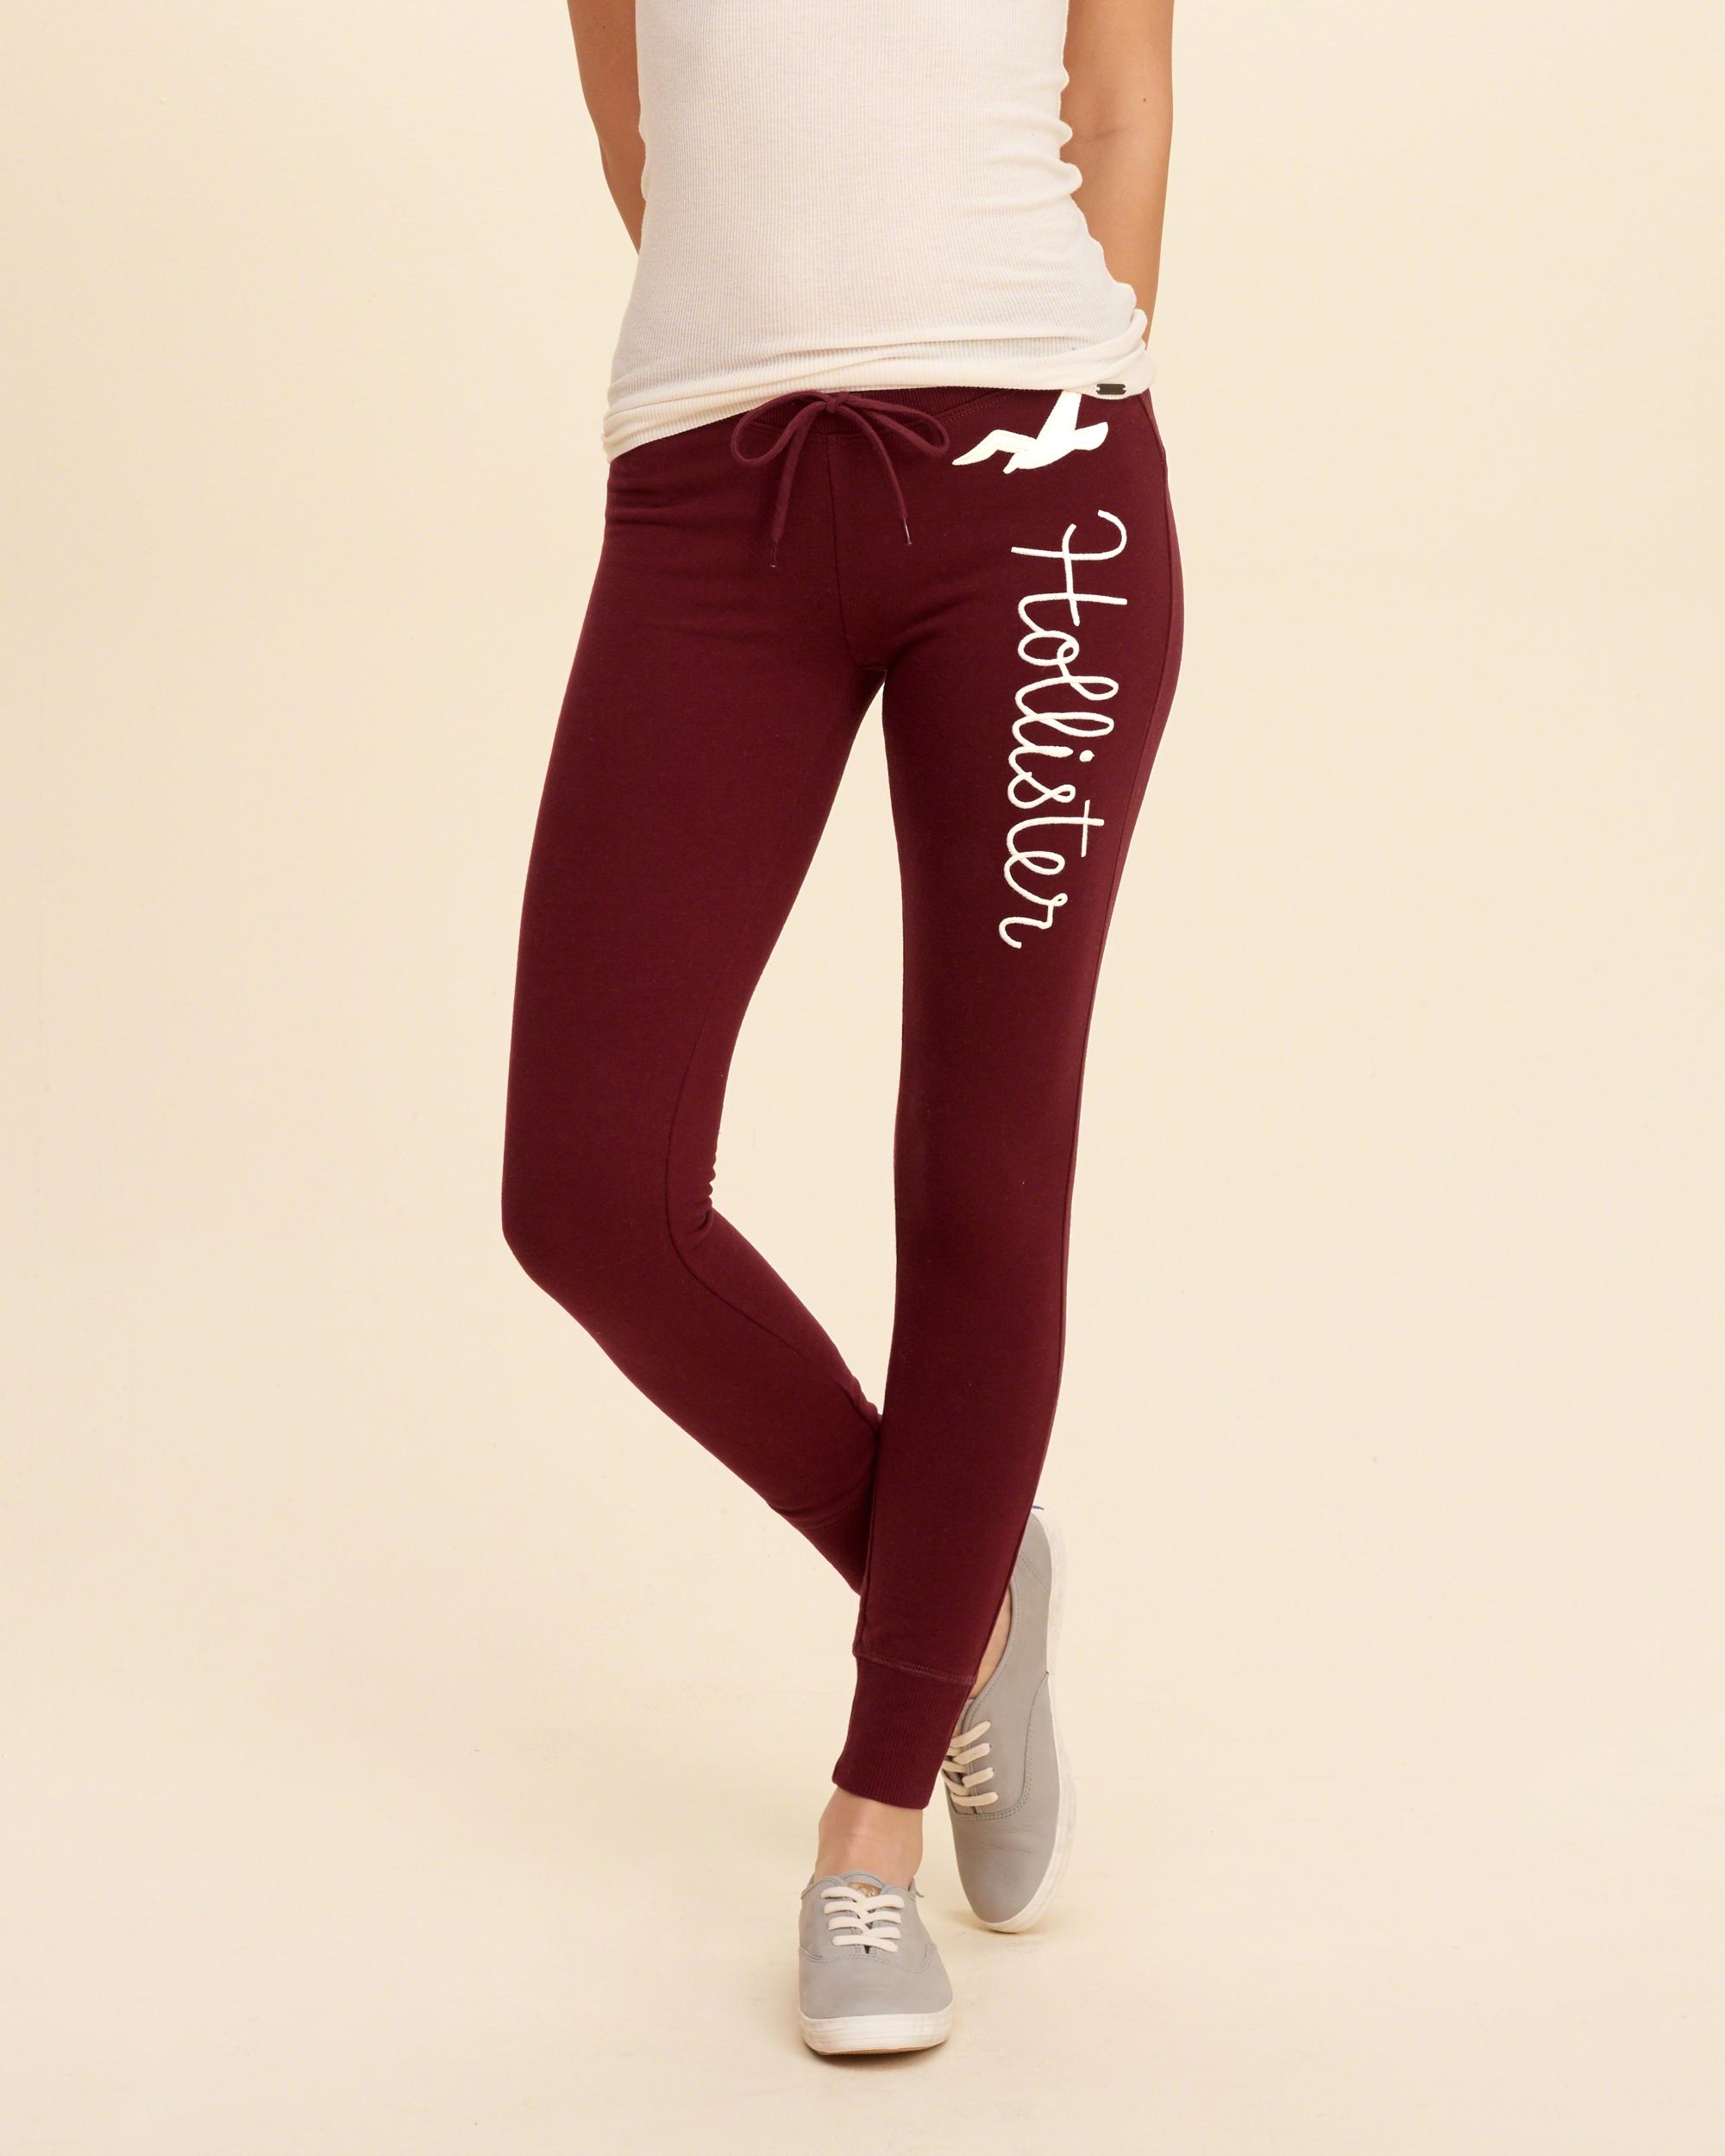 baa5dbbde9d711 Lyst - Hollister Graphic Fleece Leggings in Red